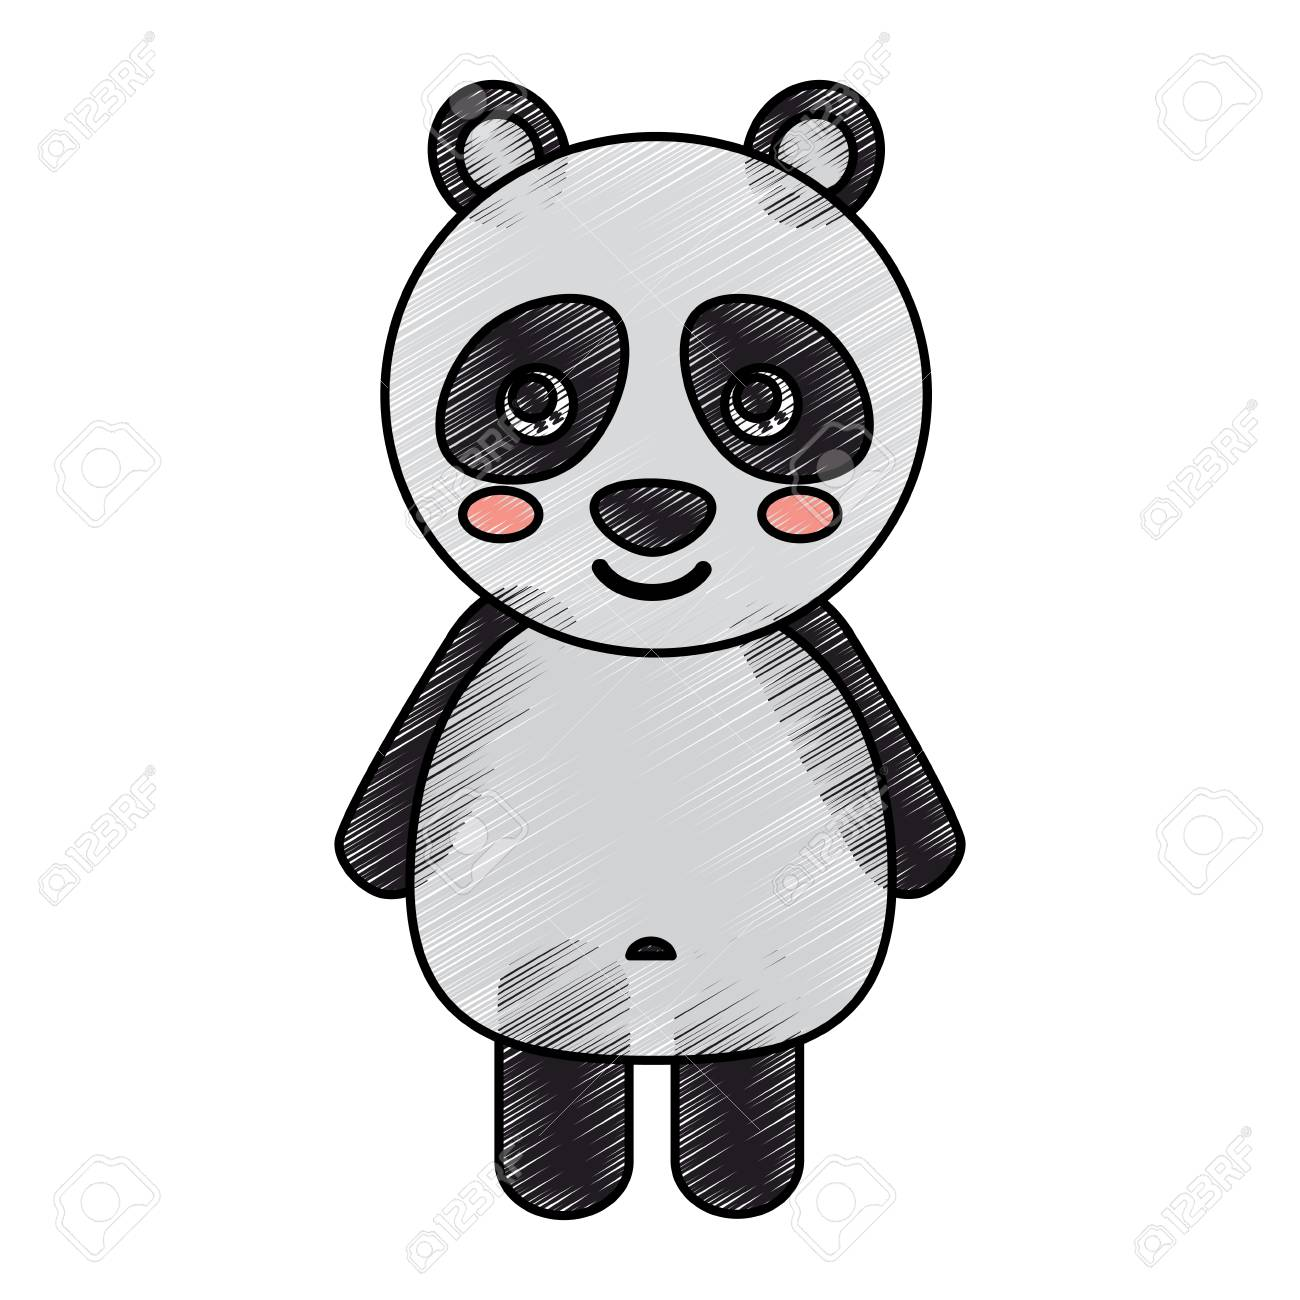 Panda Cute Animal Icon Image Vector Illustration Design Sketck